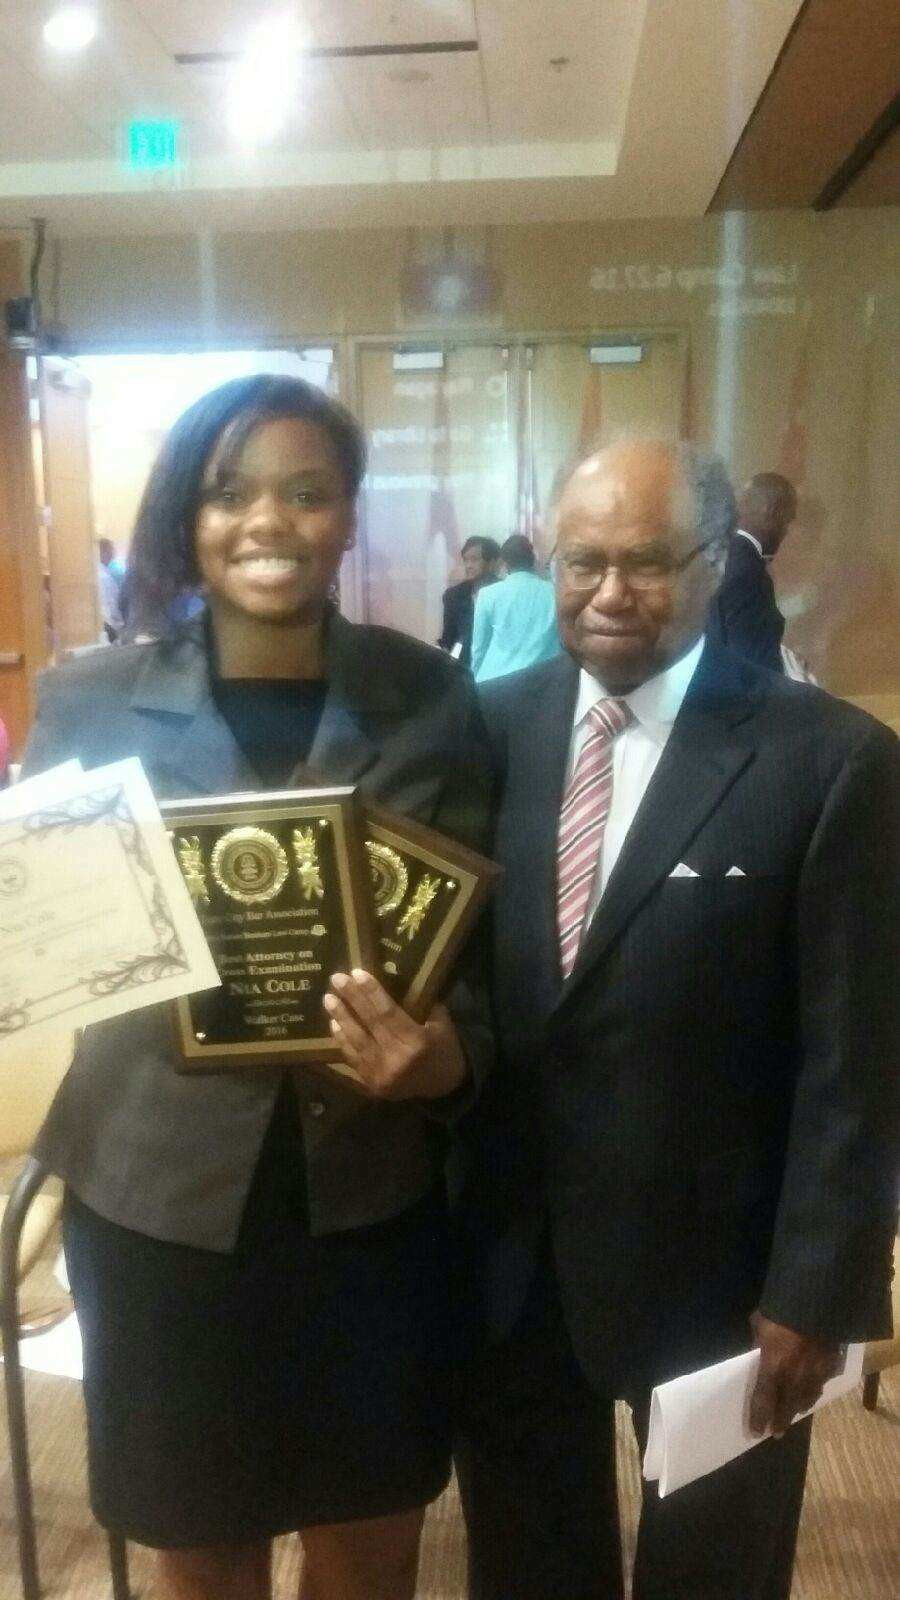 Supreme Court of Georgia Justice Benham with Nia Cole Gate City Mock Trial Champion